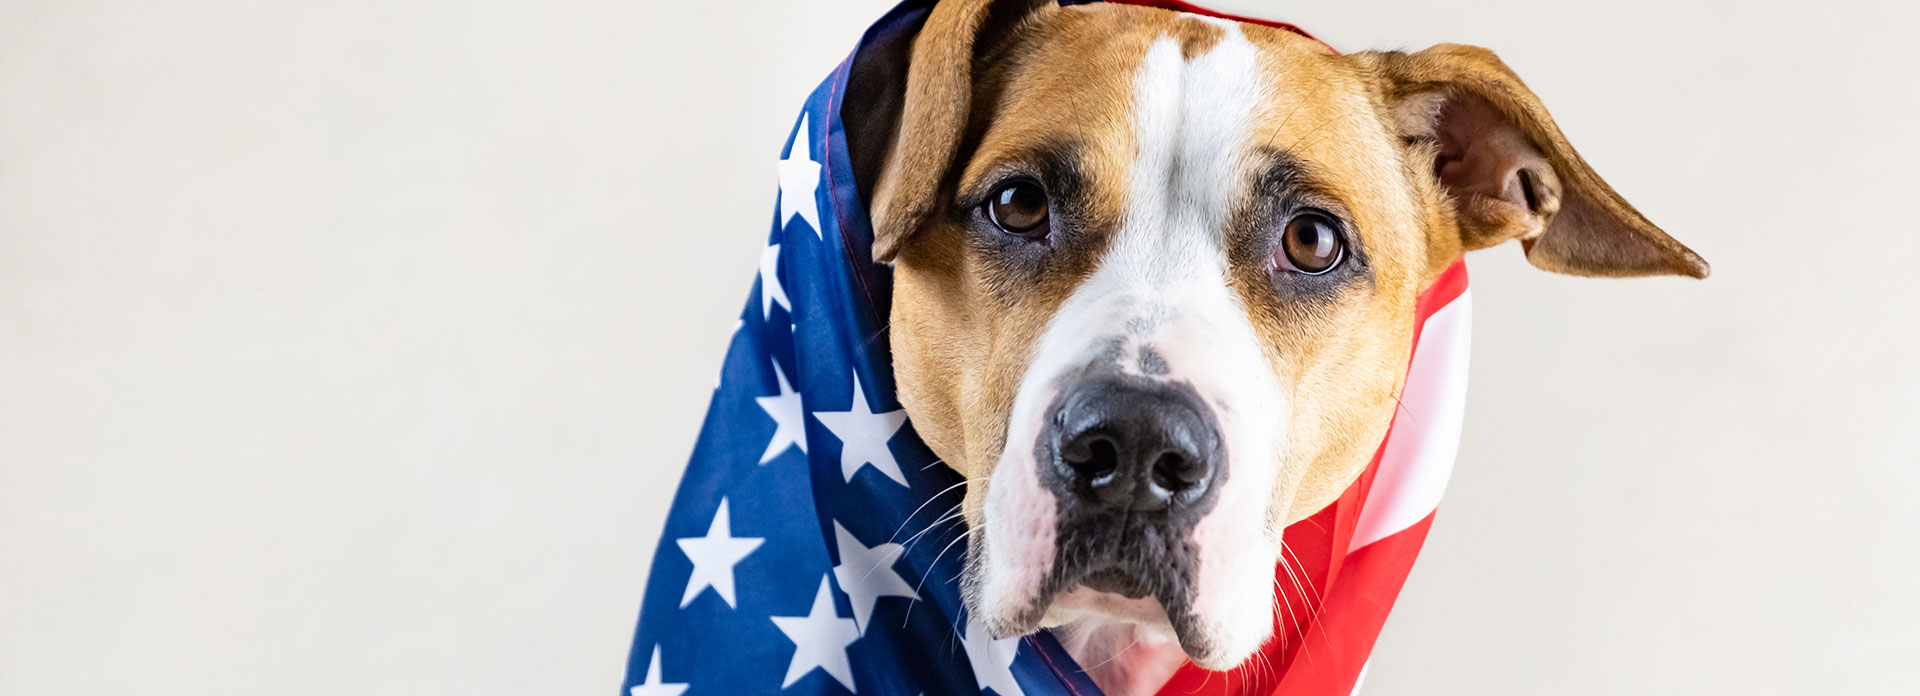 American Heroes Adoption Program